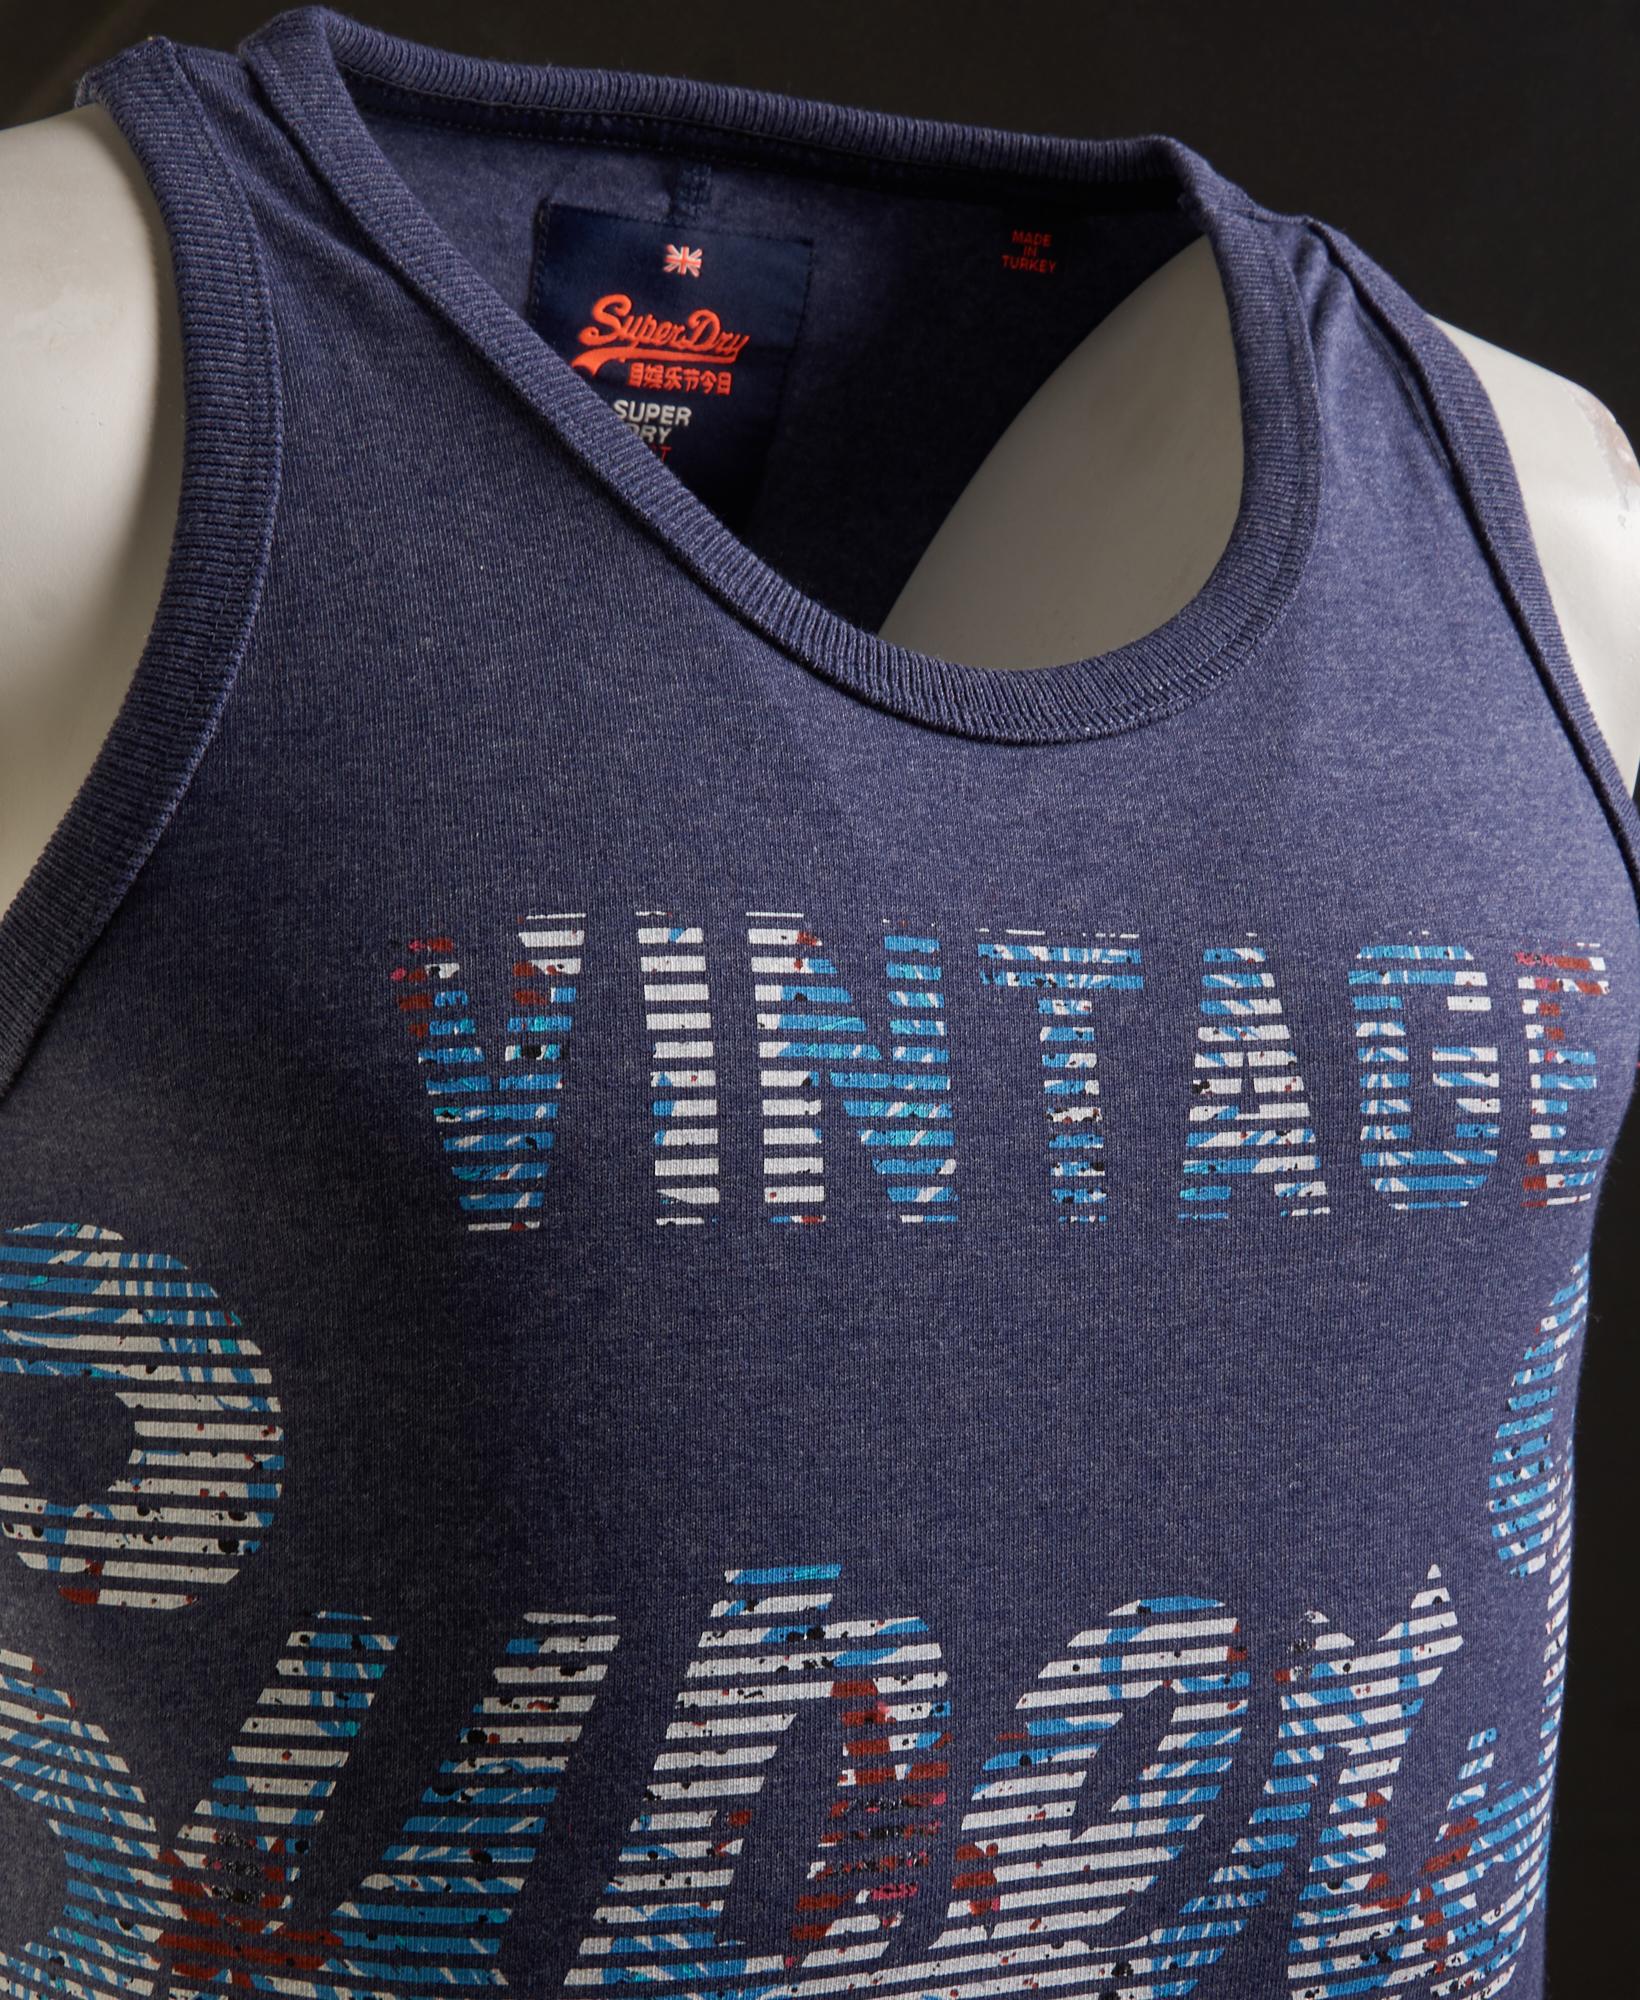 Details about Mens Superdry Premium Goods Fade Vest Top Princeton Blue Marl